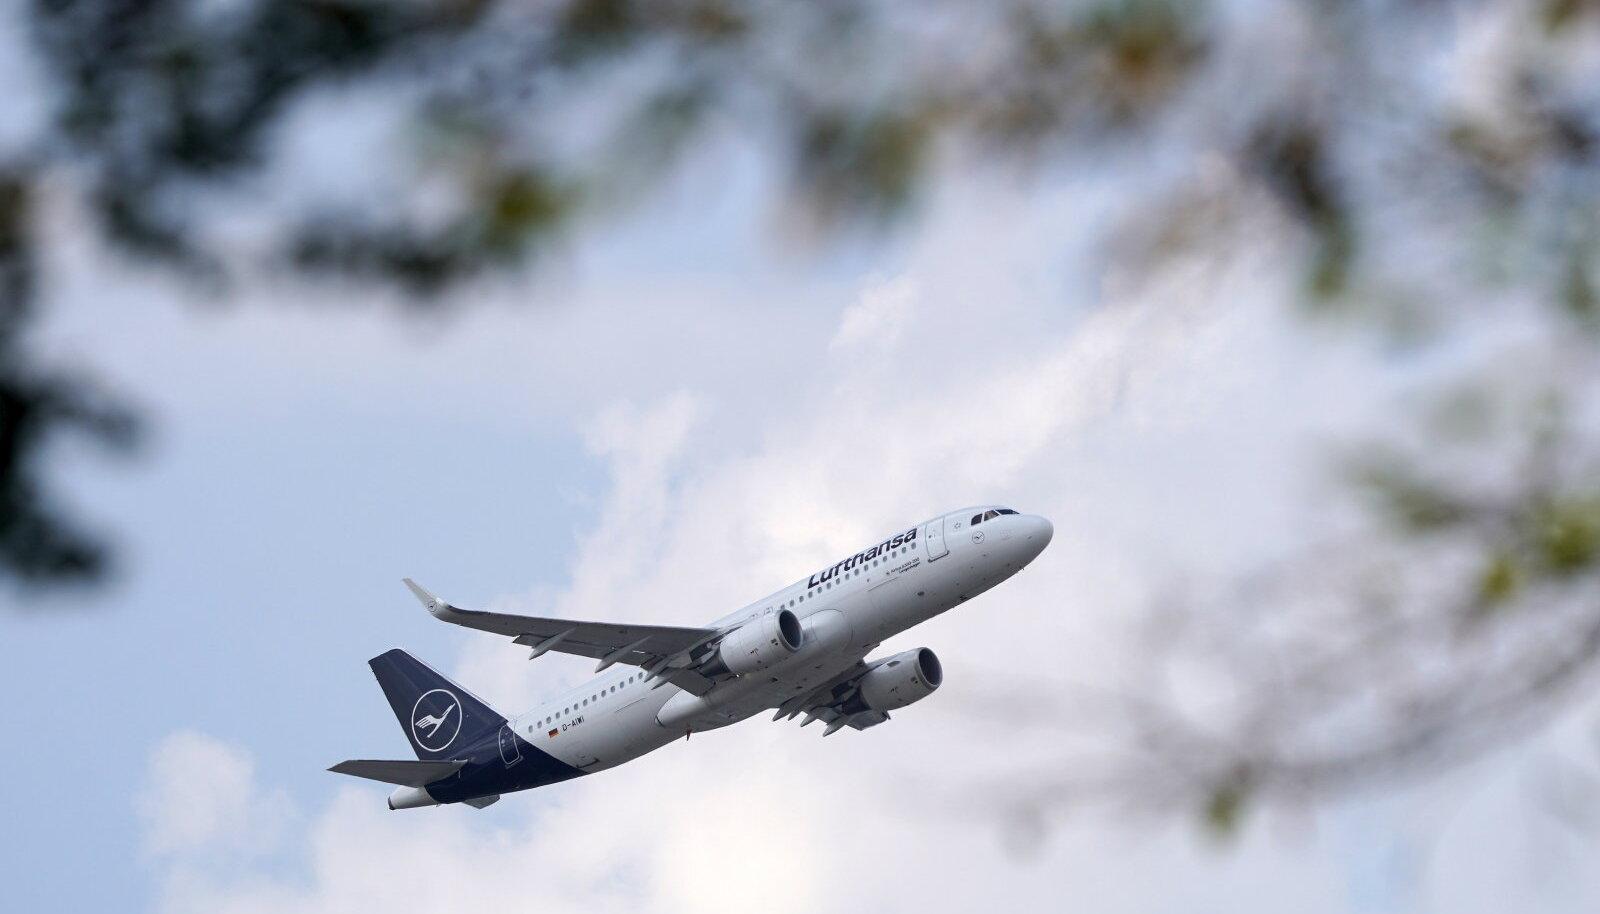 Lufthansa lennuk